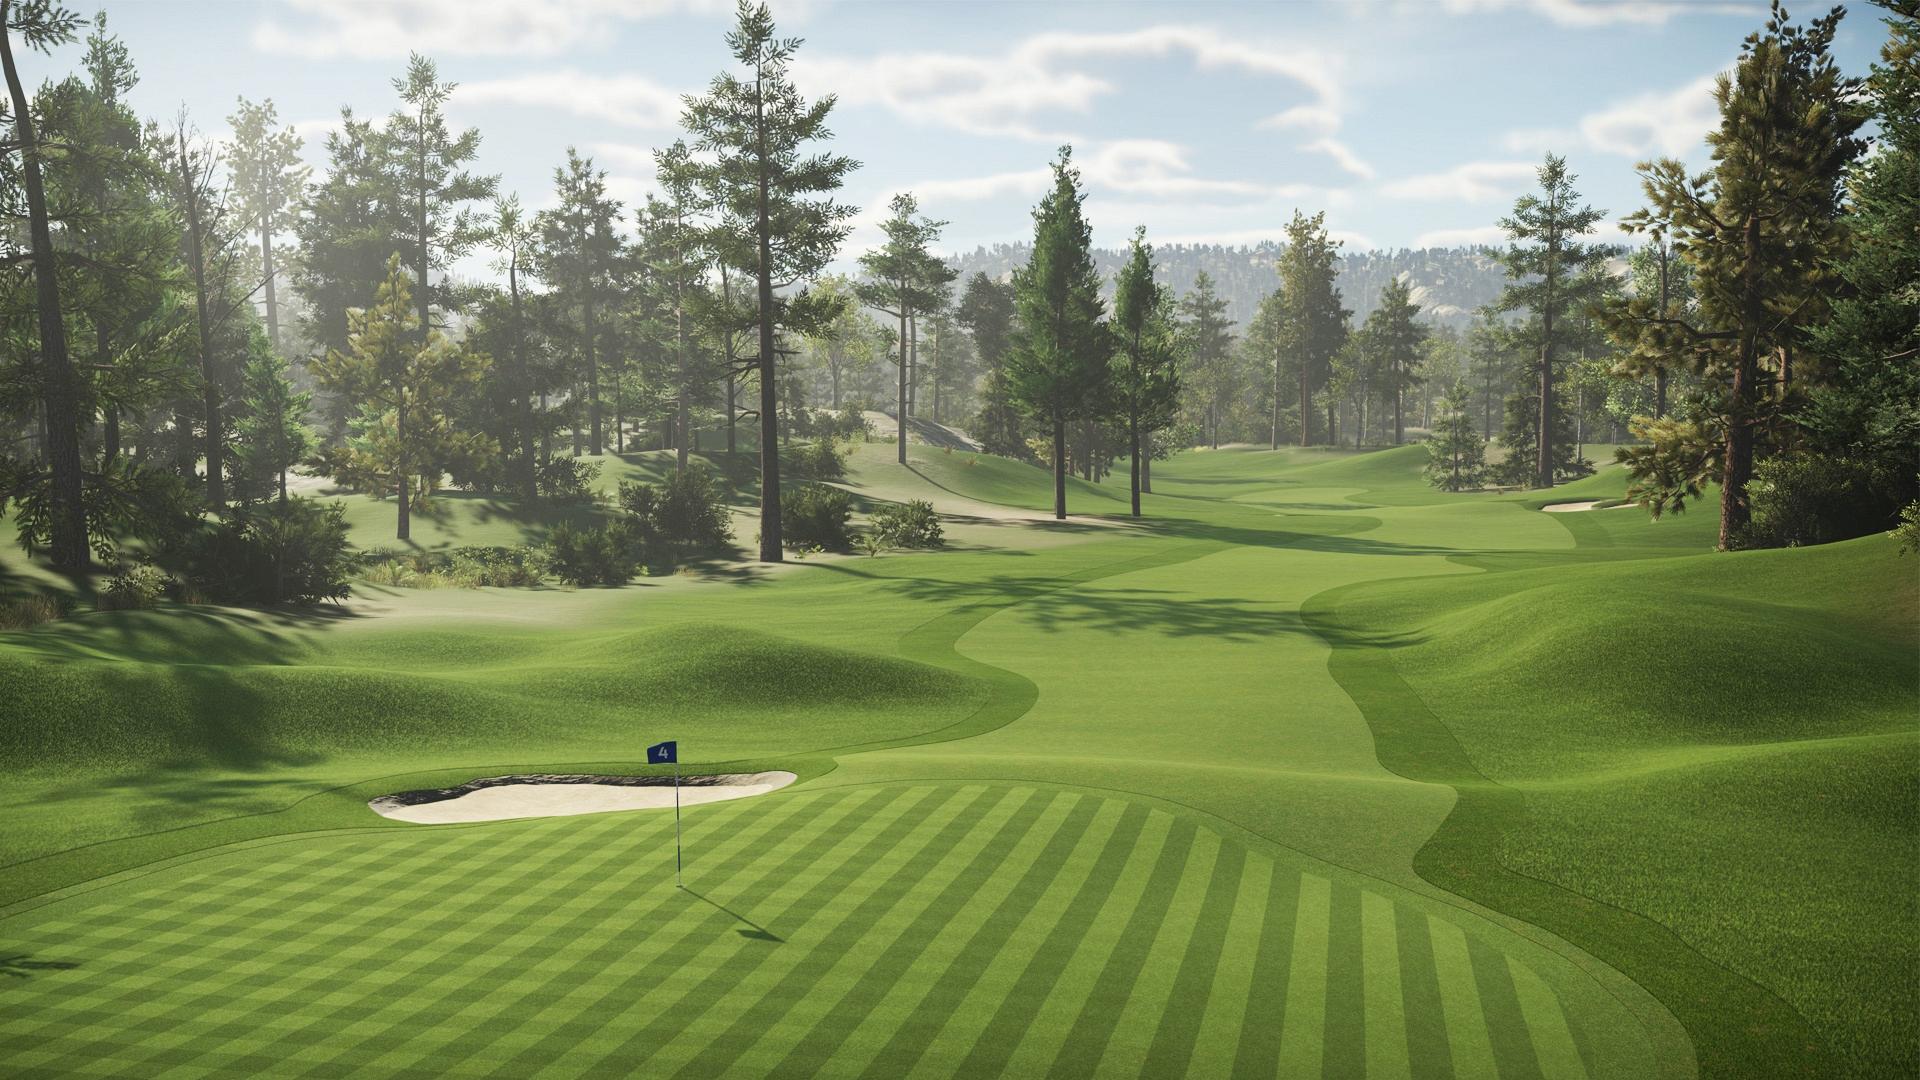 the golf club 2 herstellerbilder screenshot galerie. Black Bedroom Furniture Sets. Home Design Ideas